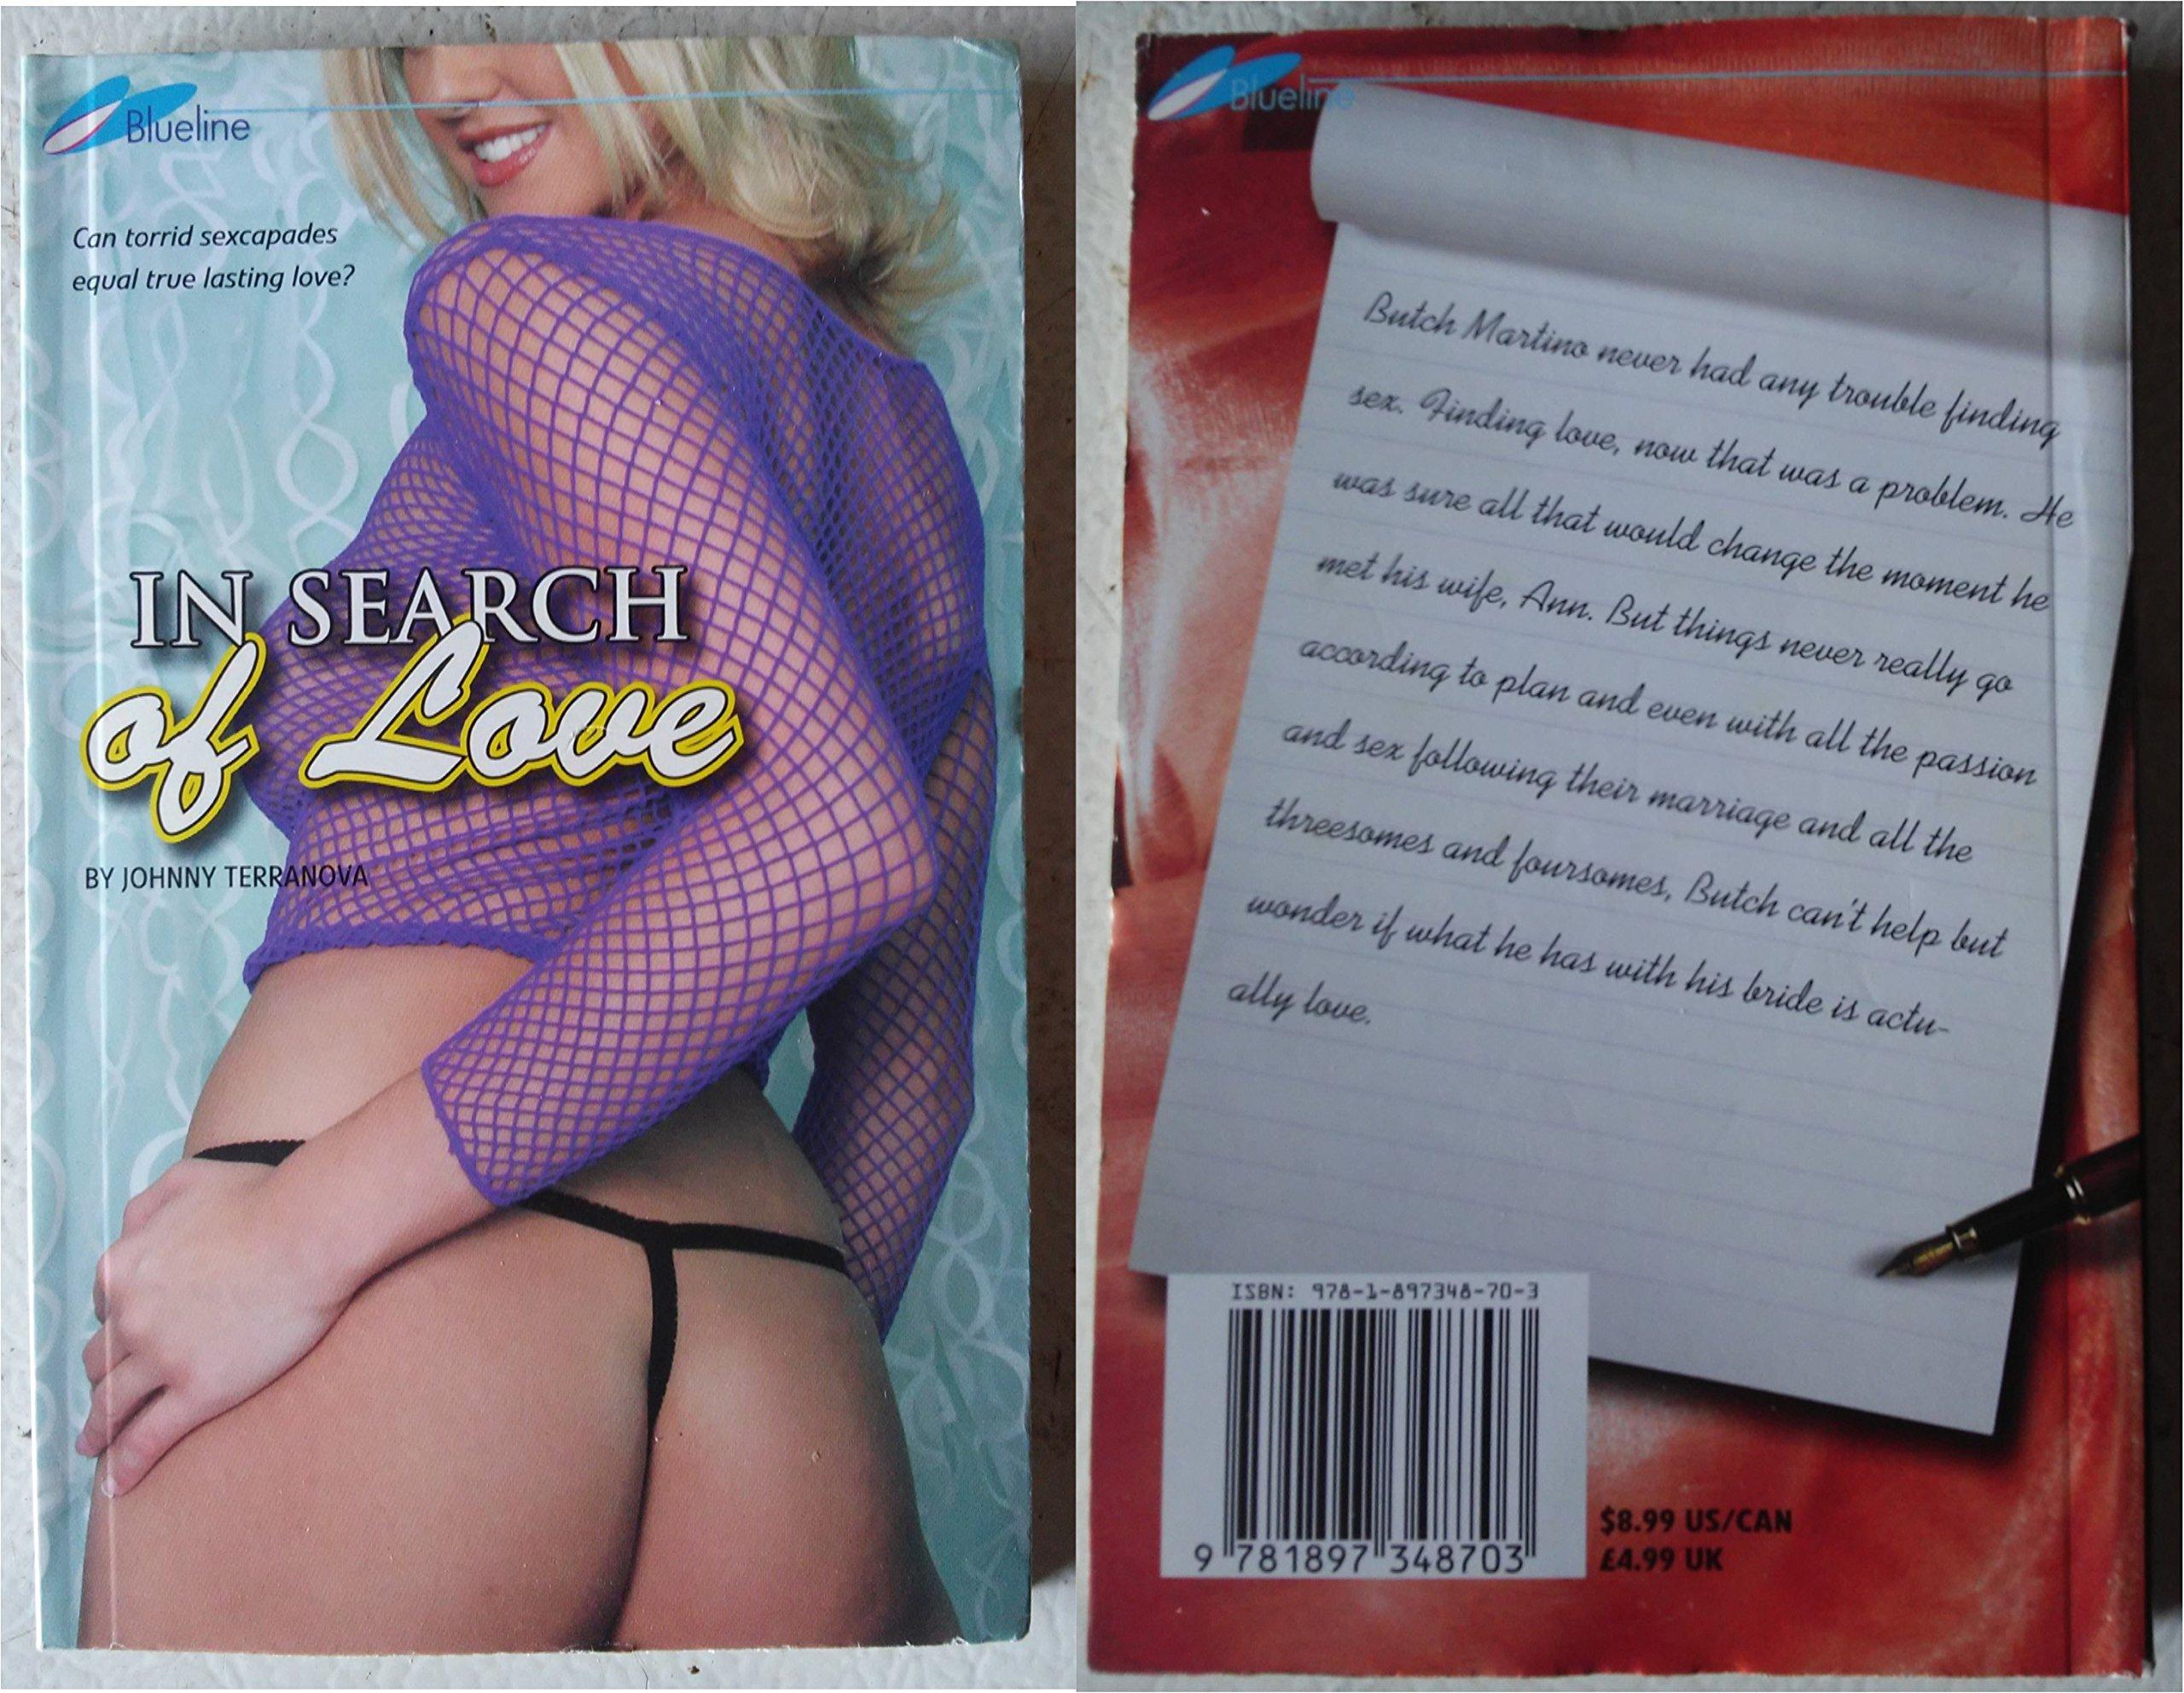 Hot cougar women porn